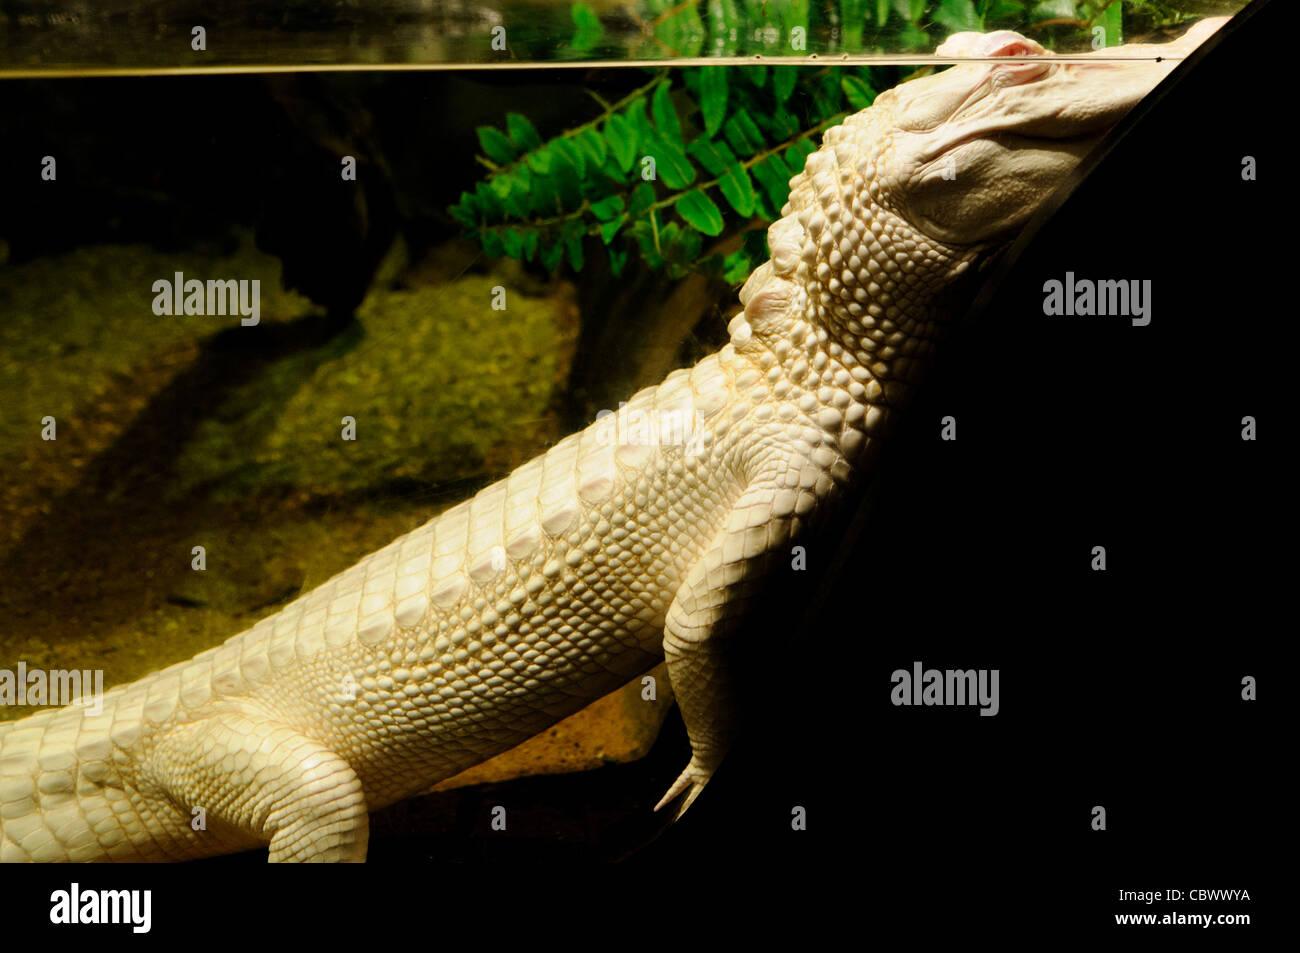 WASHINGTON DC, USA - A rare albino alligator named Oleander on display at the National Aquarium in downtown Washington - Stock Image